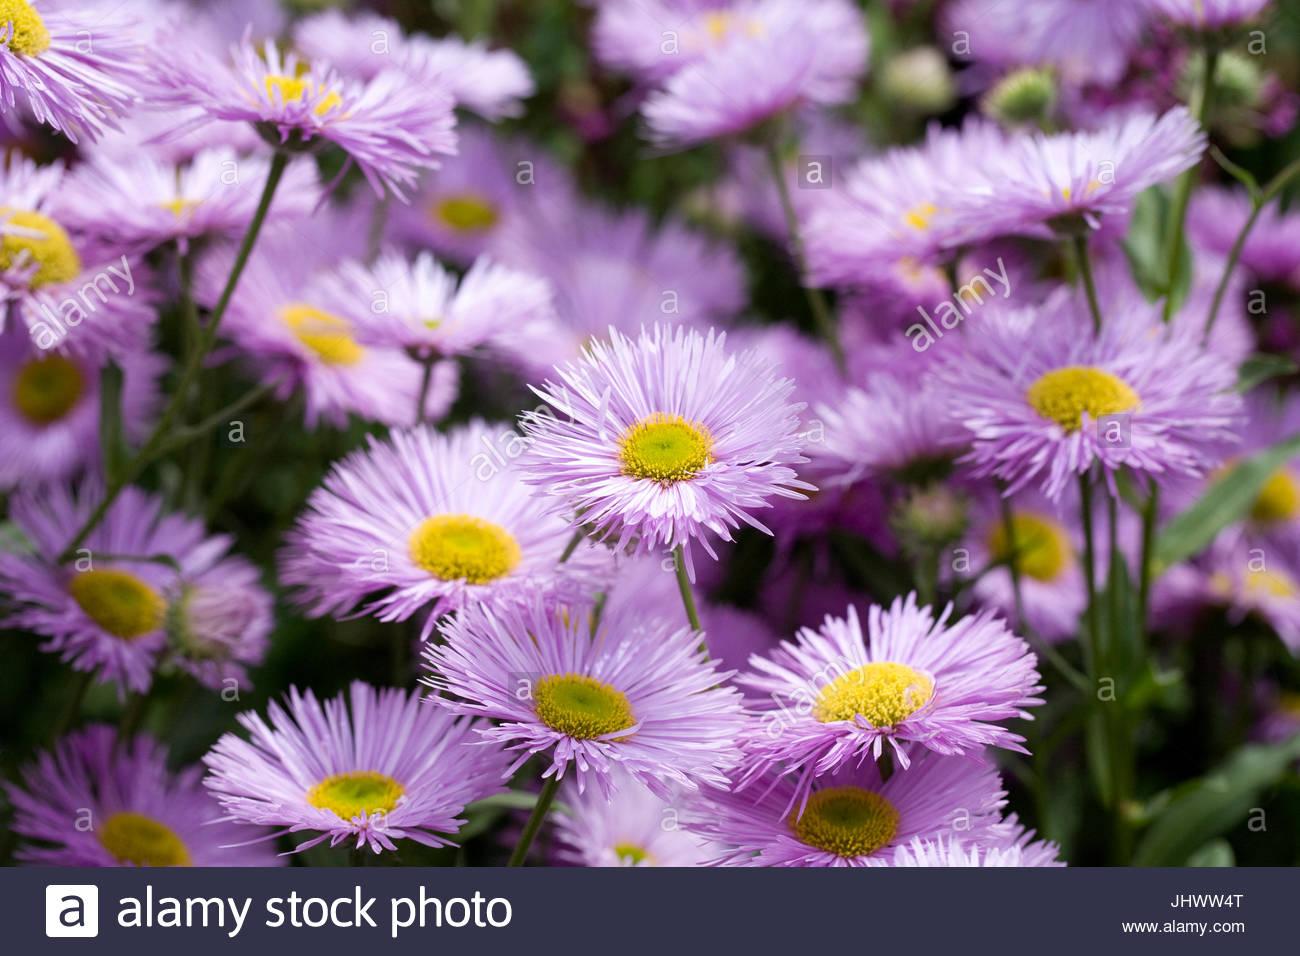 Erigeron 'Prosperity' flowers in the garden - Stock Image